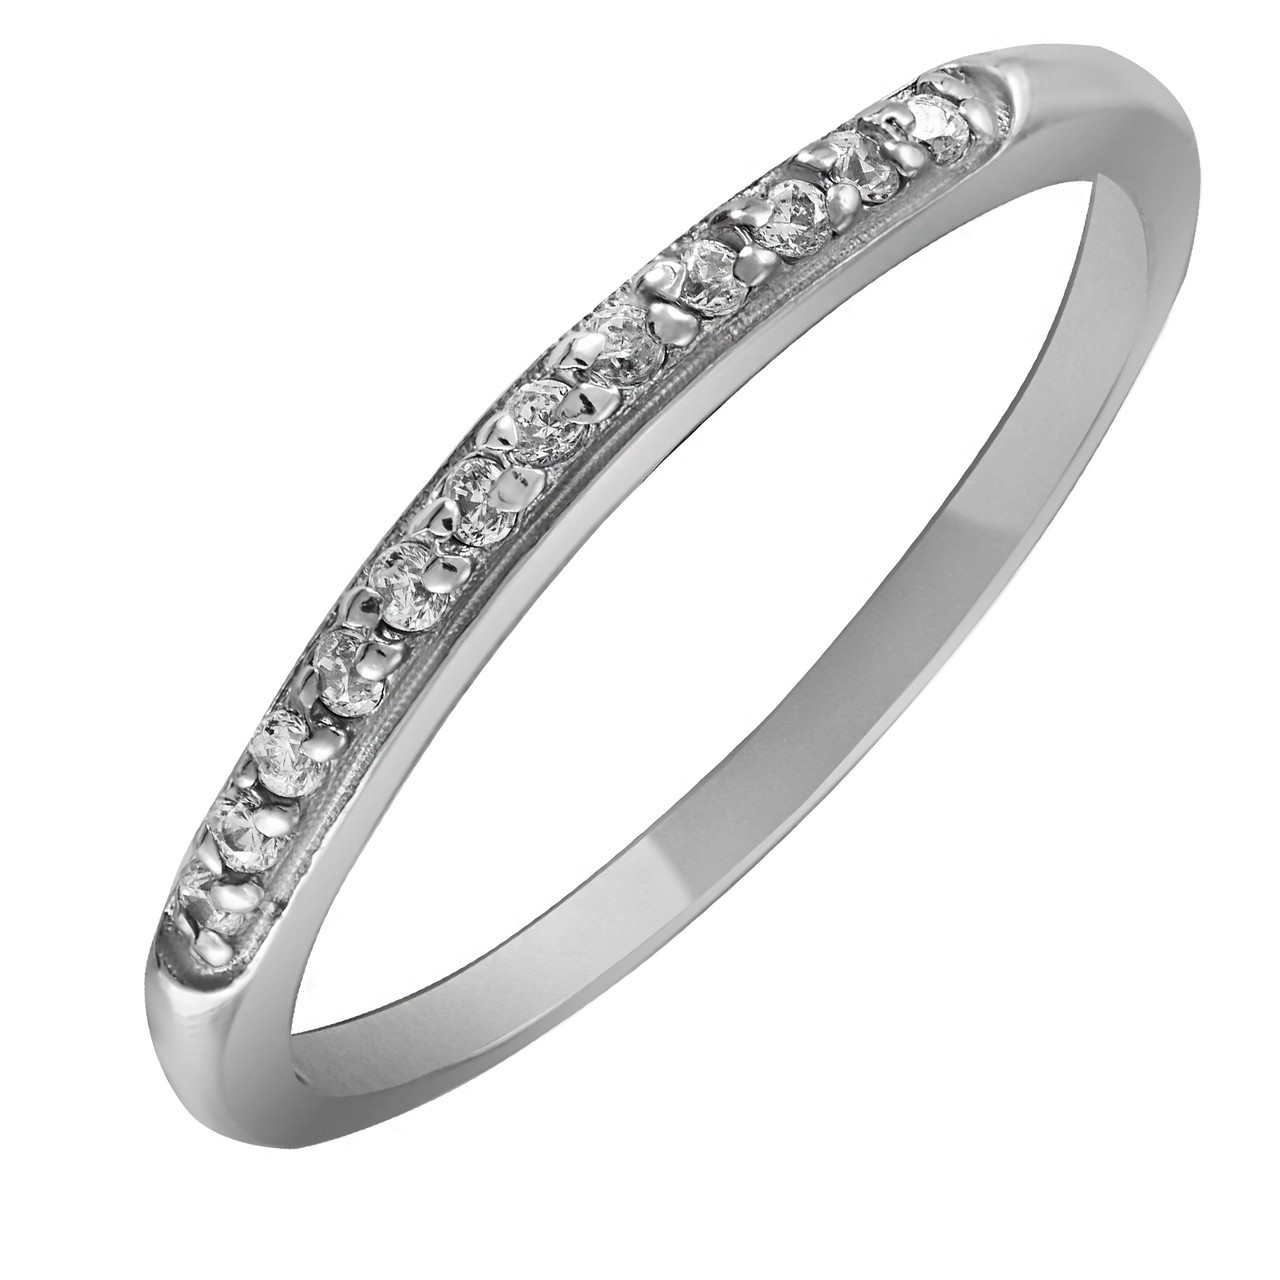 Кольцо из серебра с куб. циркониями Twiddle Jewelry 21.0 размер (К014-21.0)